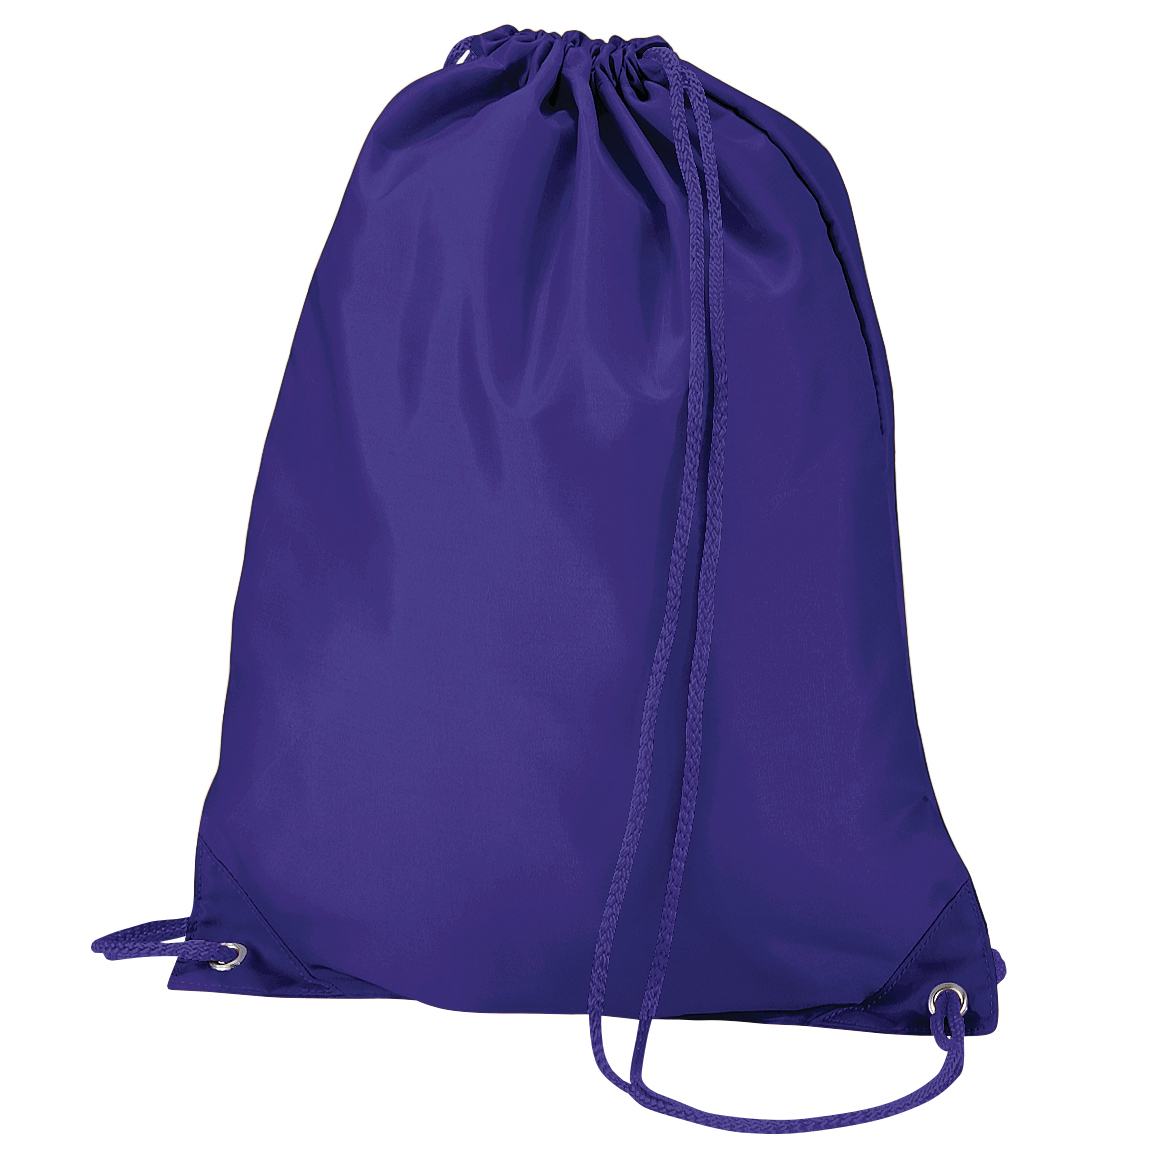 Quadra Gymsac Shoulder Carry Bag - 7 Litres (Pack of 2) (One Size) (Purple)